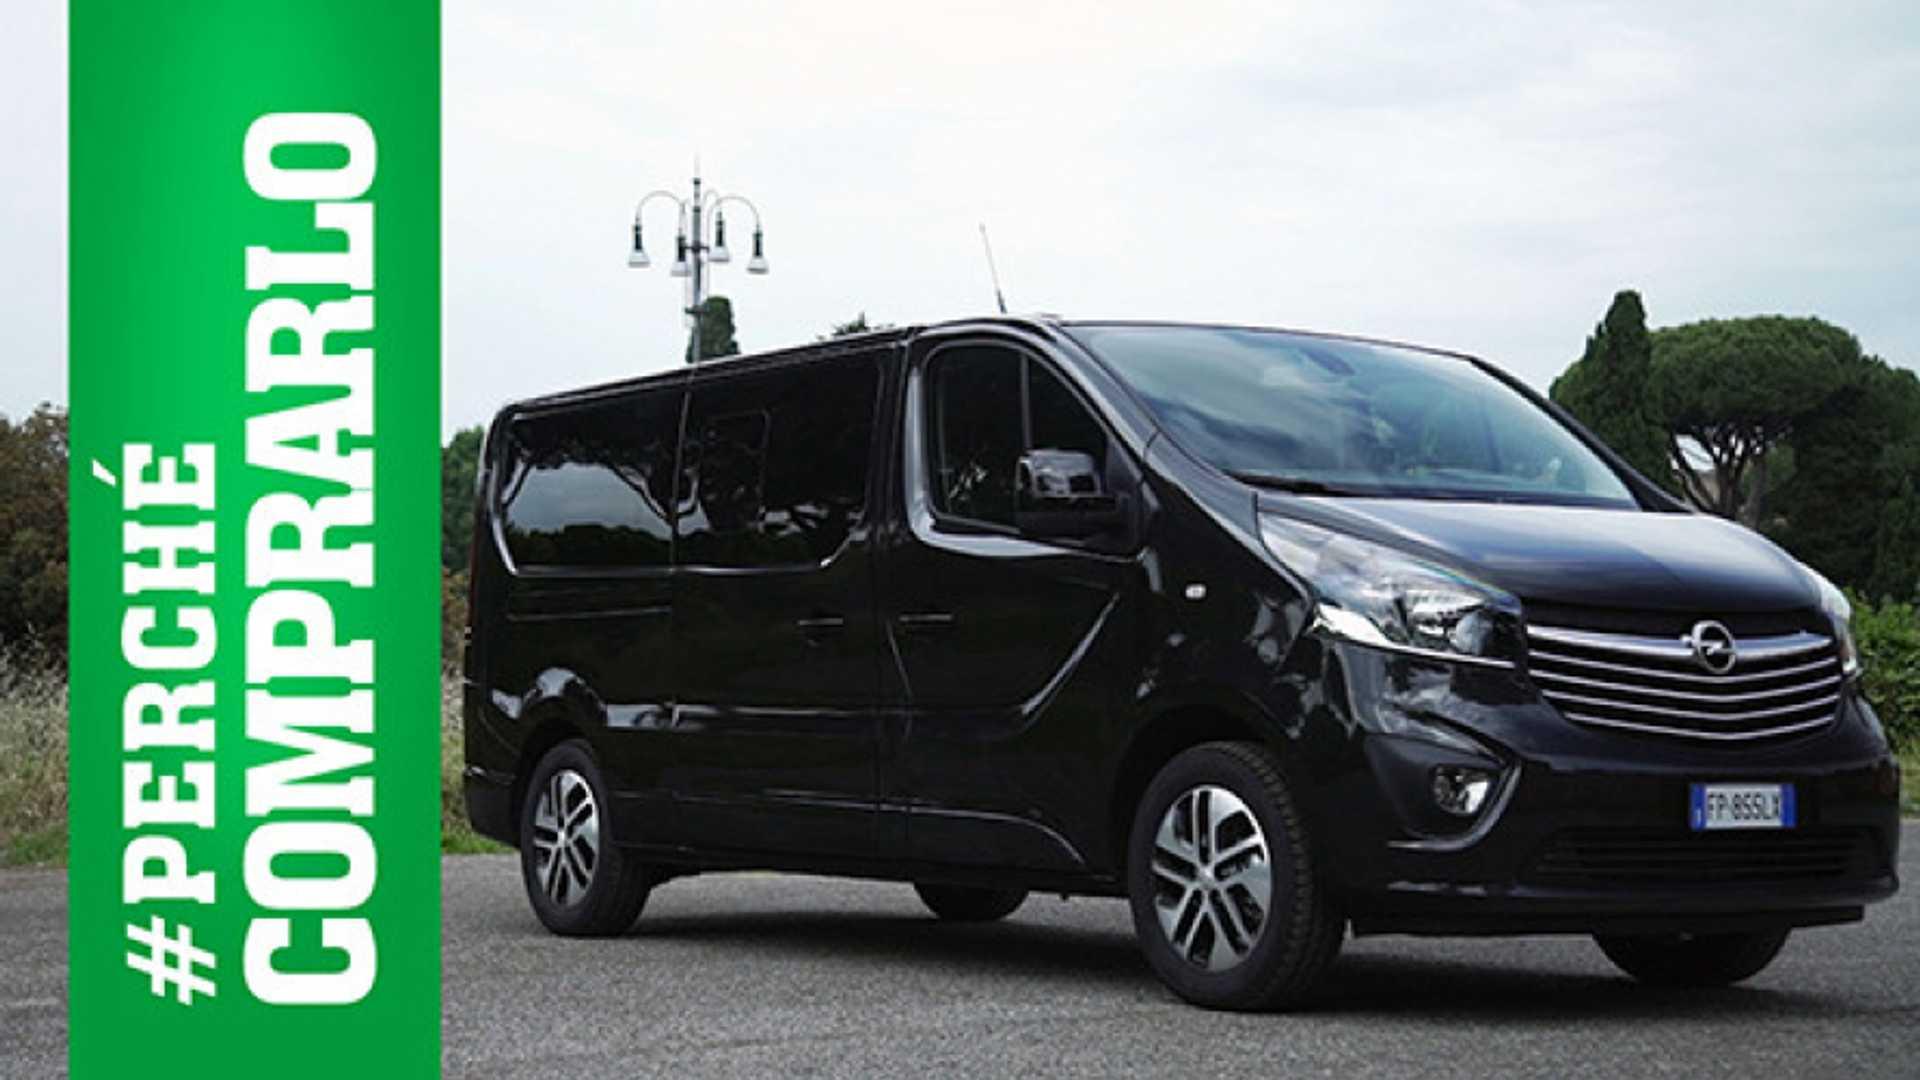 Schemi Elettrici Opel Vivaro : Opel vivaro tourer perché comprarlo e perché no